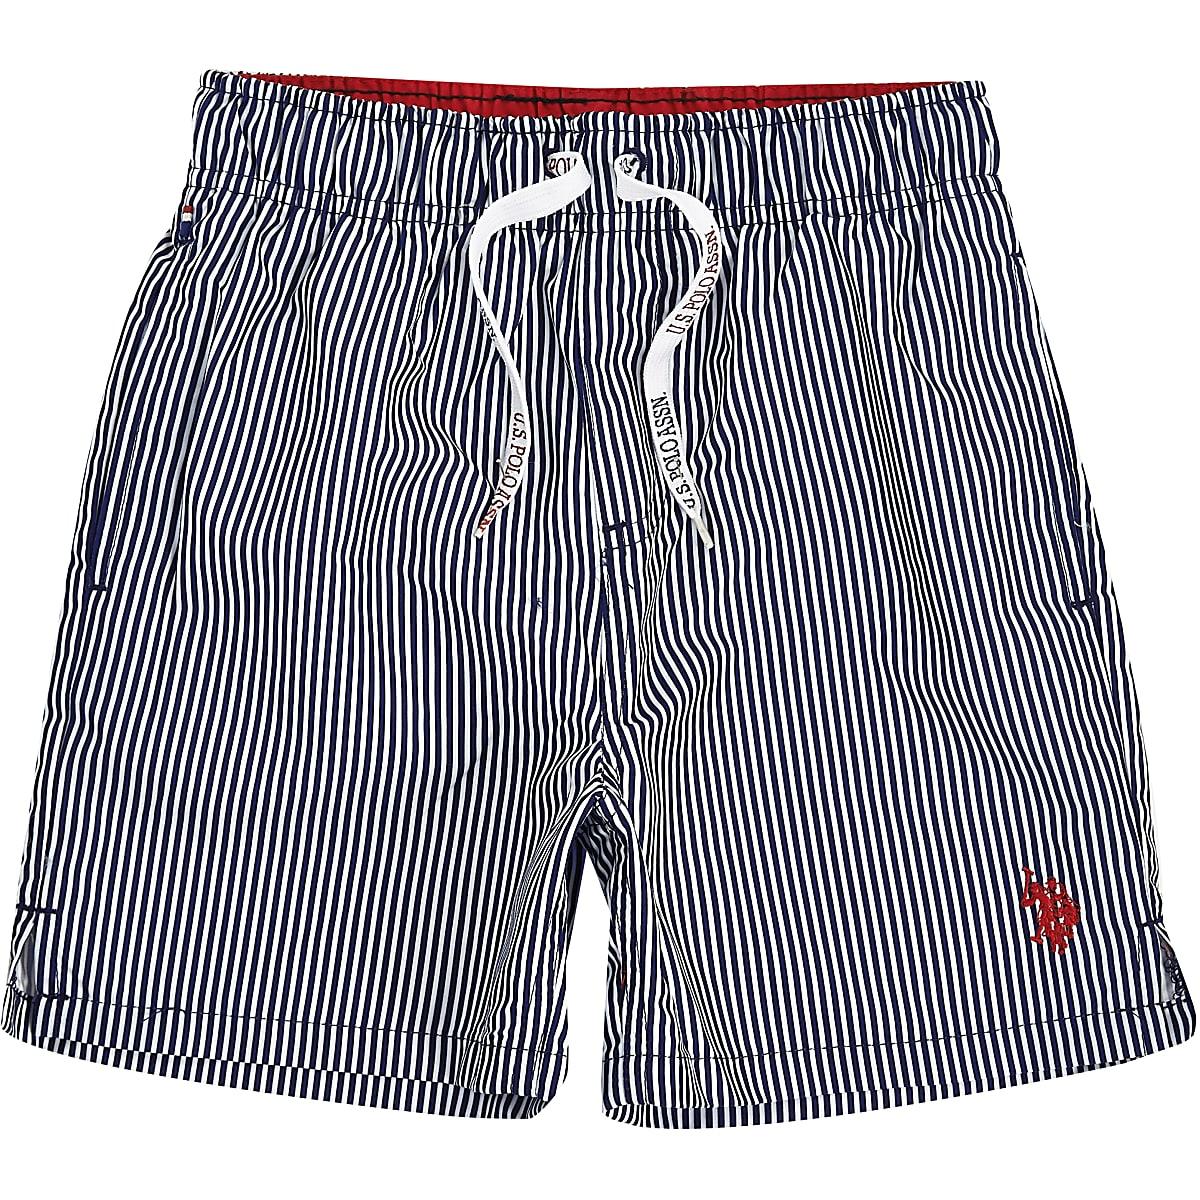 Boys navy U.S. Polo Assn. swim shorts